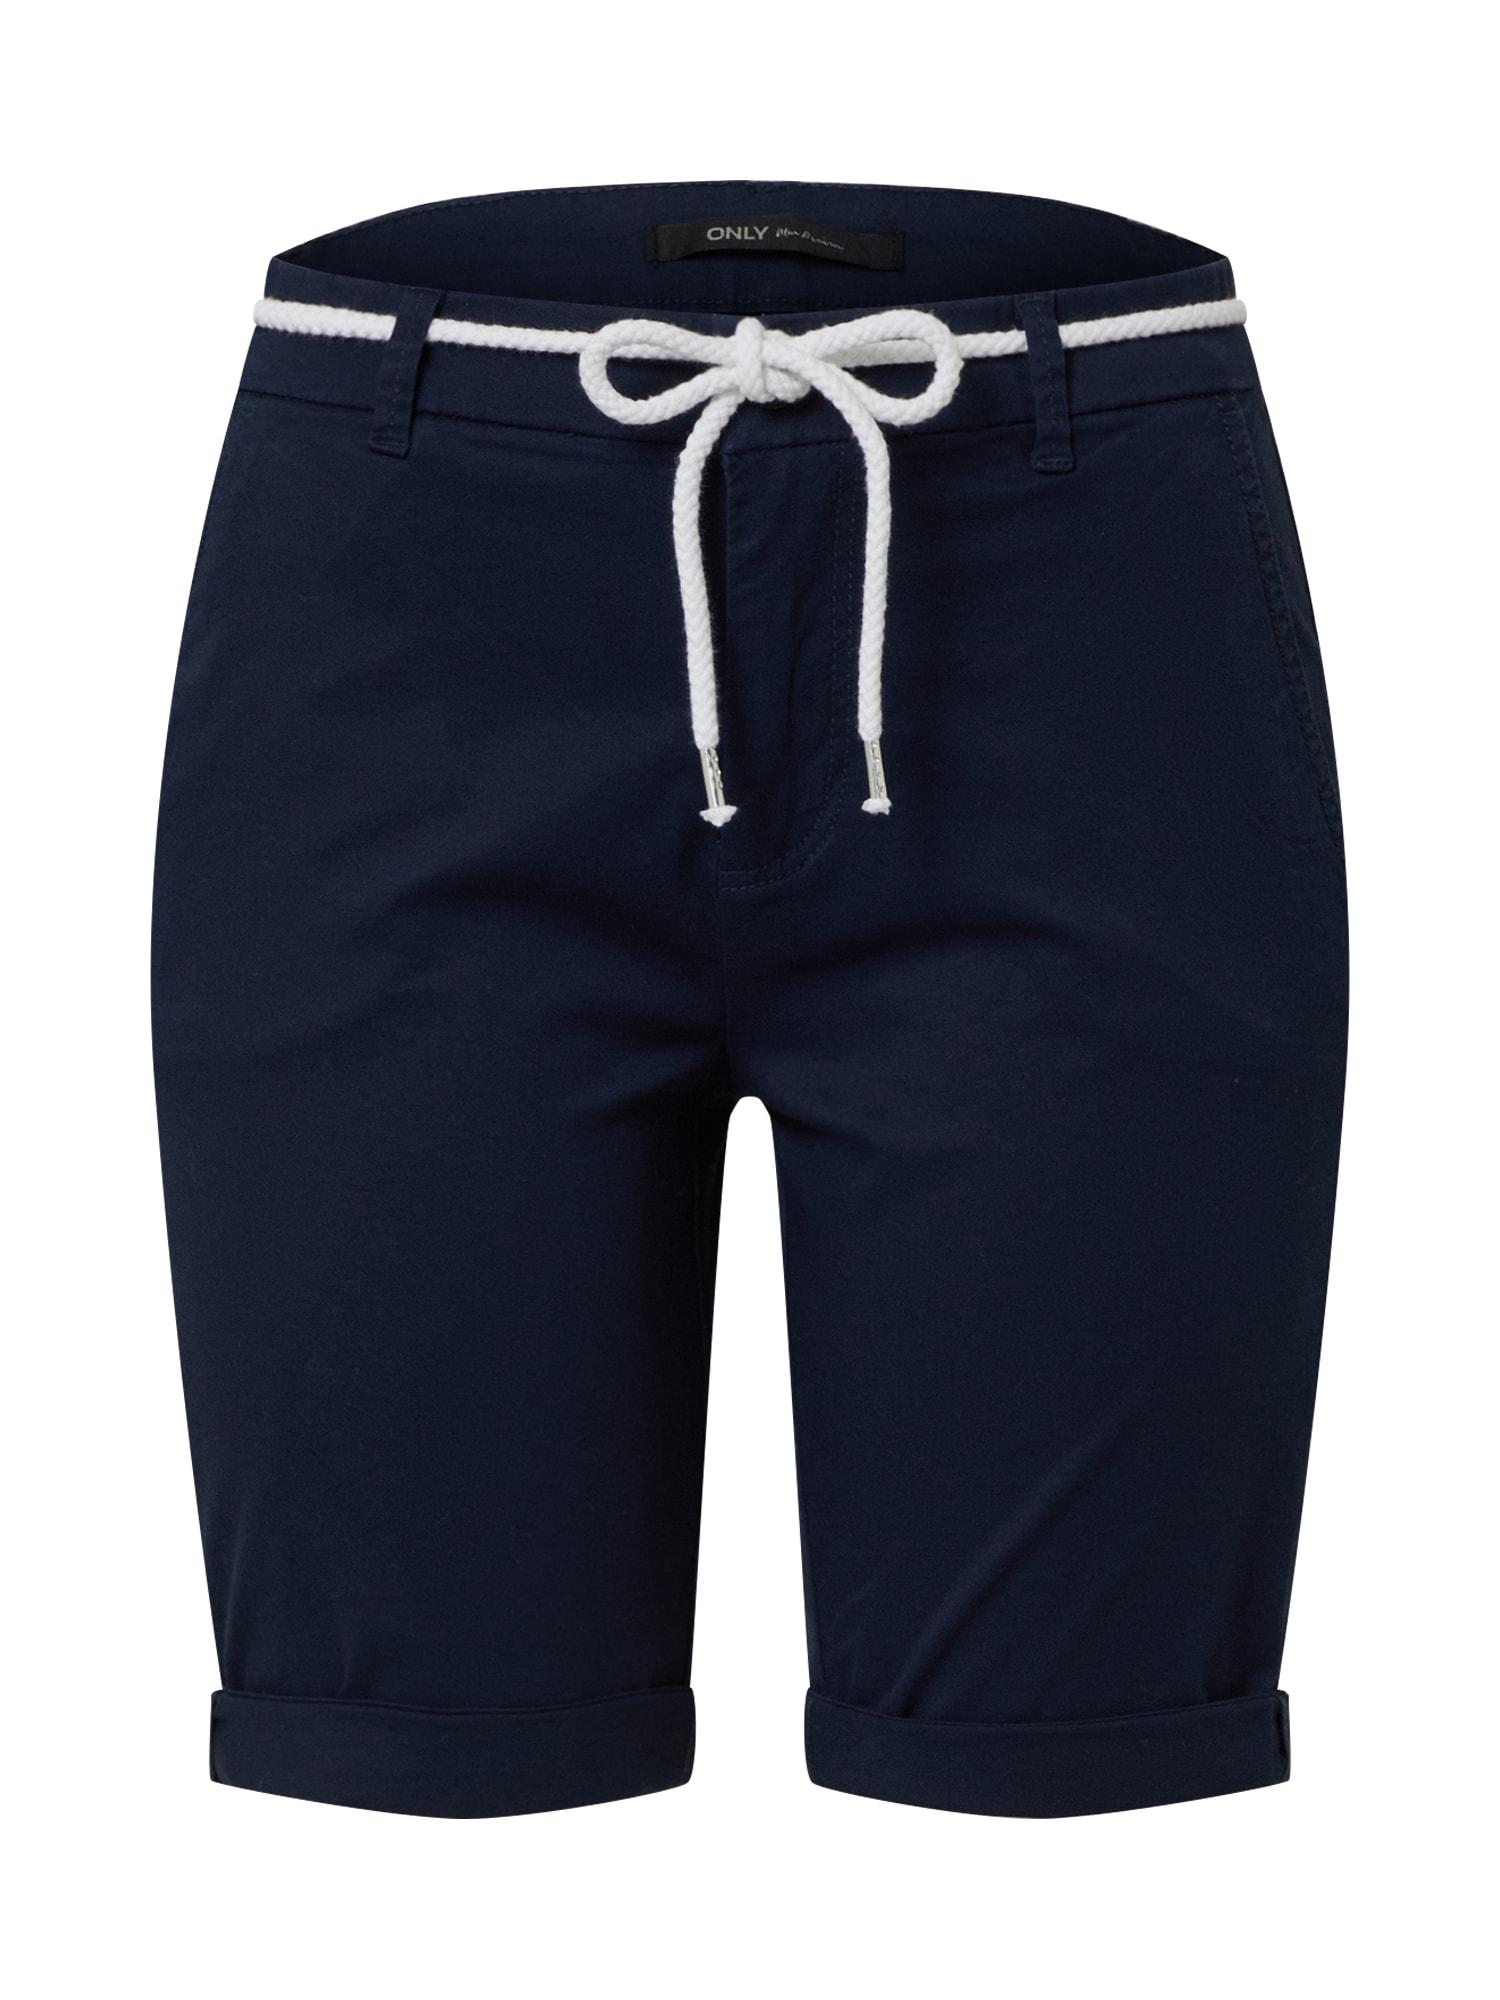 "ONLY ""Chino"" stiliaus kelnės tamsiai mėlyna"